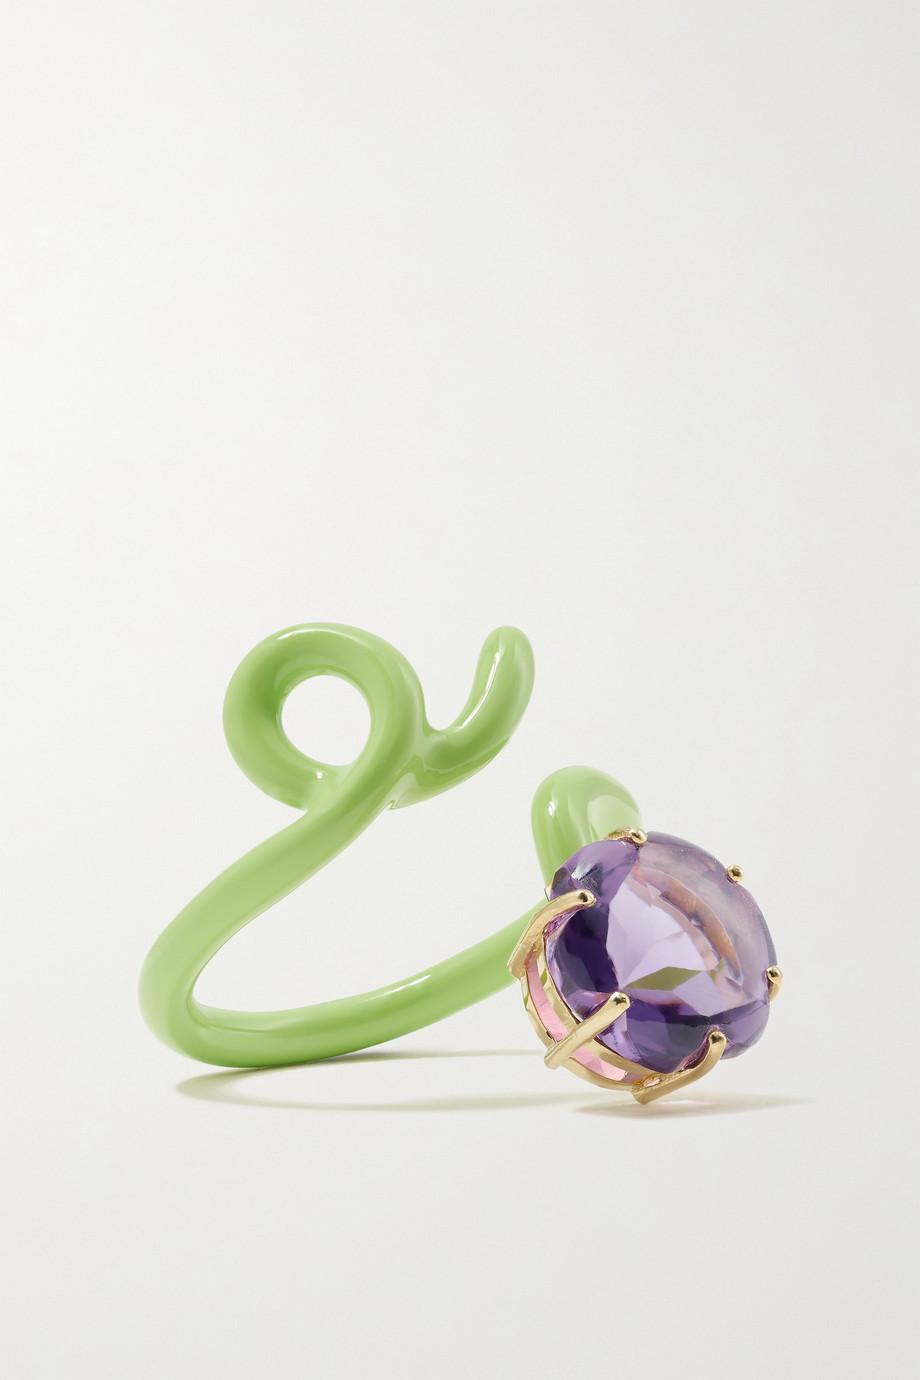 Bea Bongiasca Flower Funk 9-karat gold, silver, enamel and amethyst ring